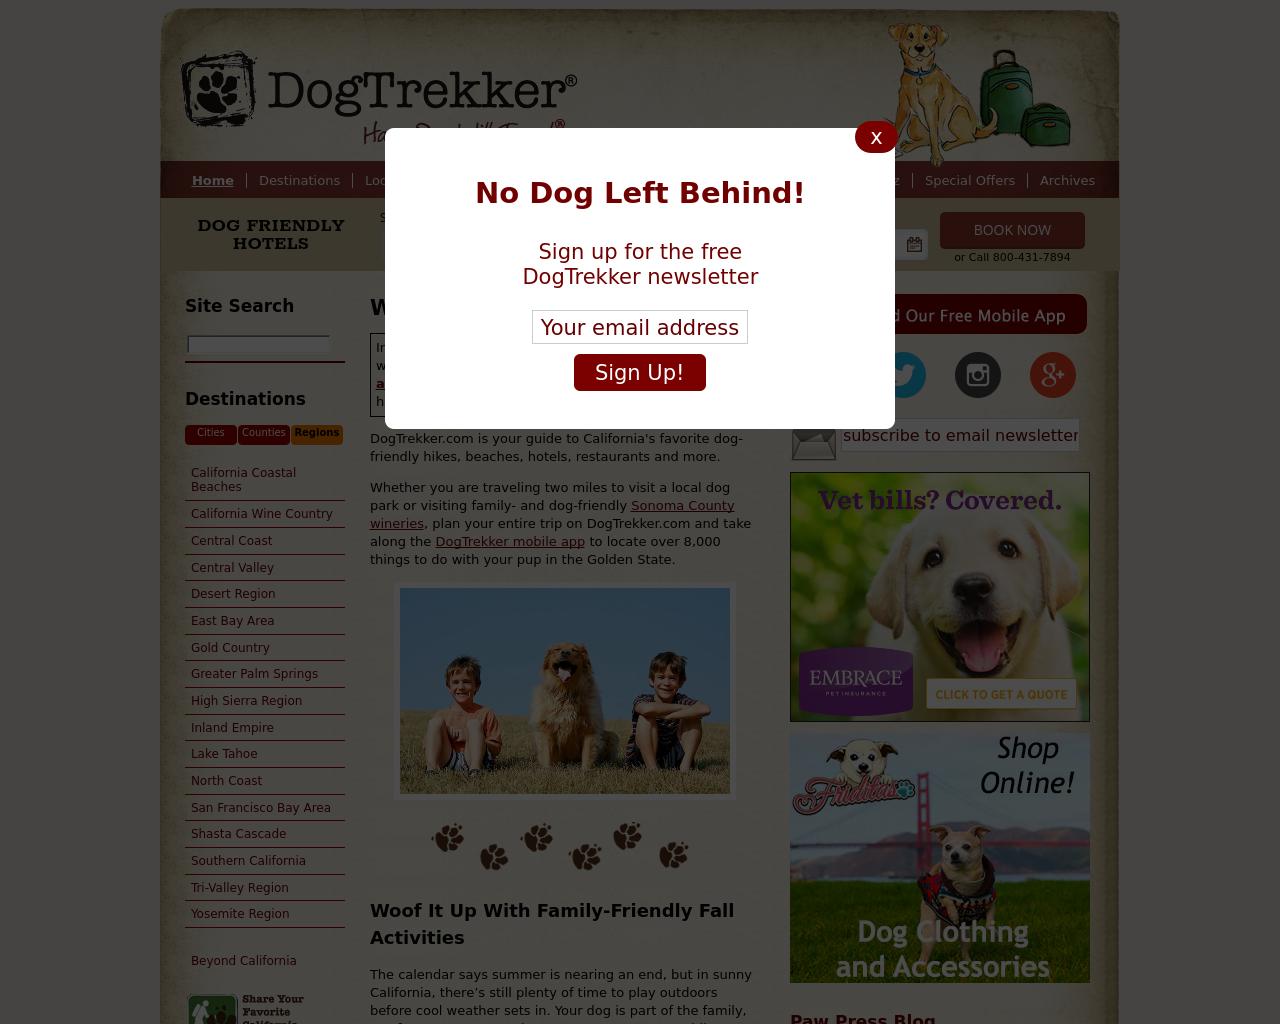 Dog-Trekker-Advertising-Reviews-Pricing